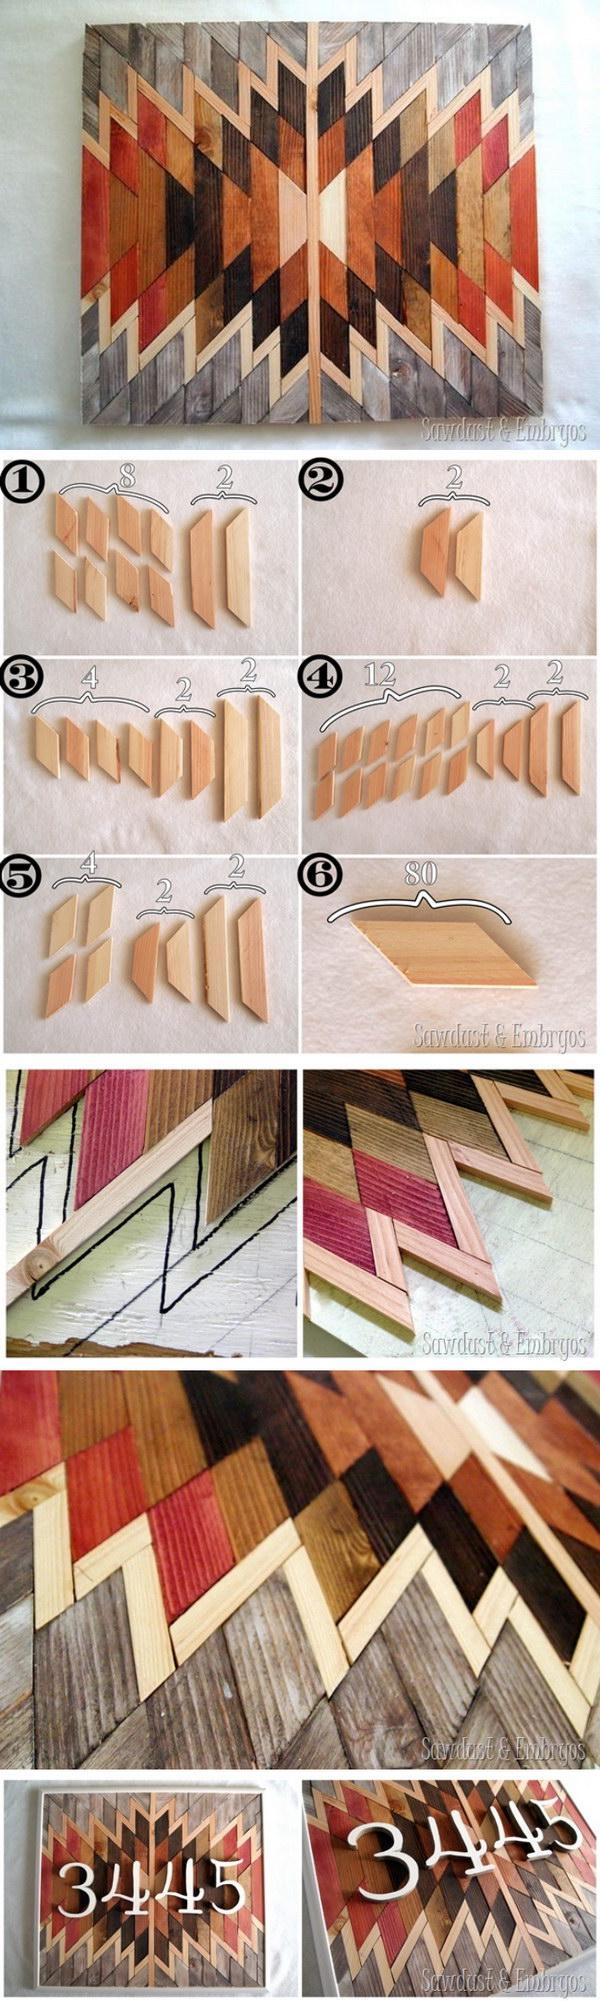 DIY Wooden Native Wall Art.